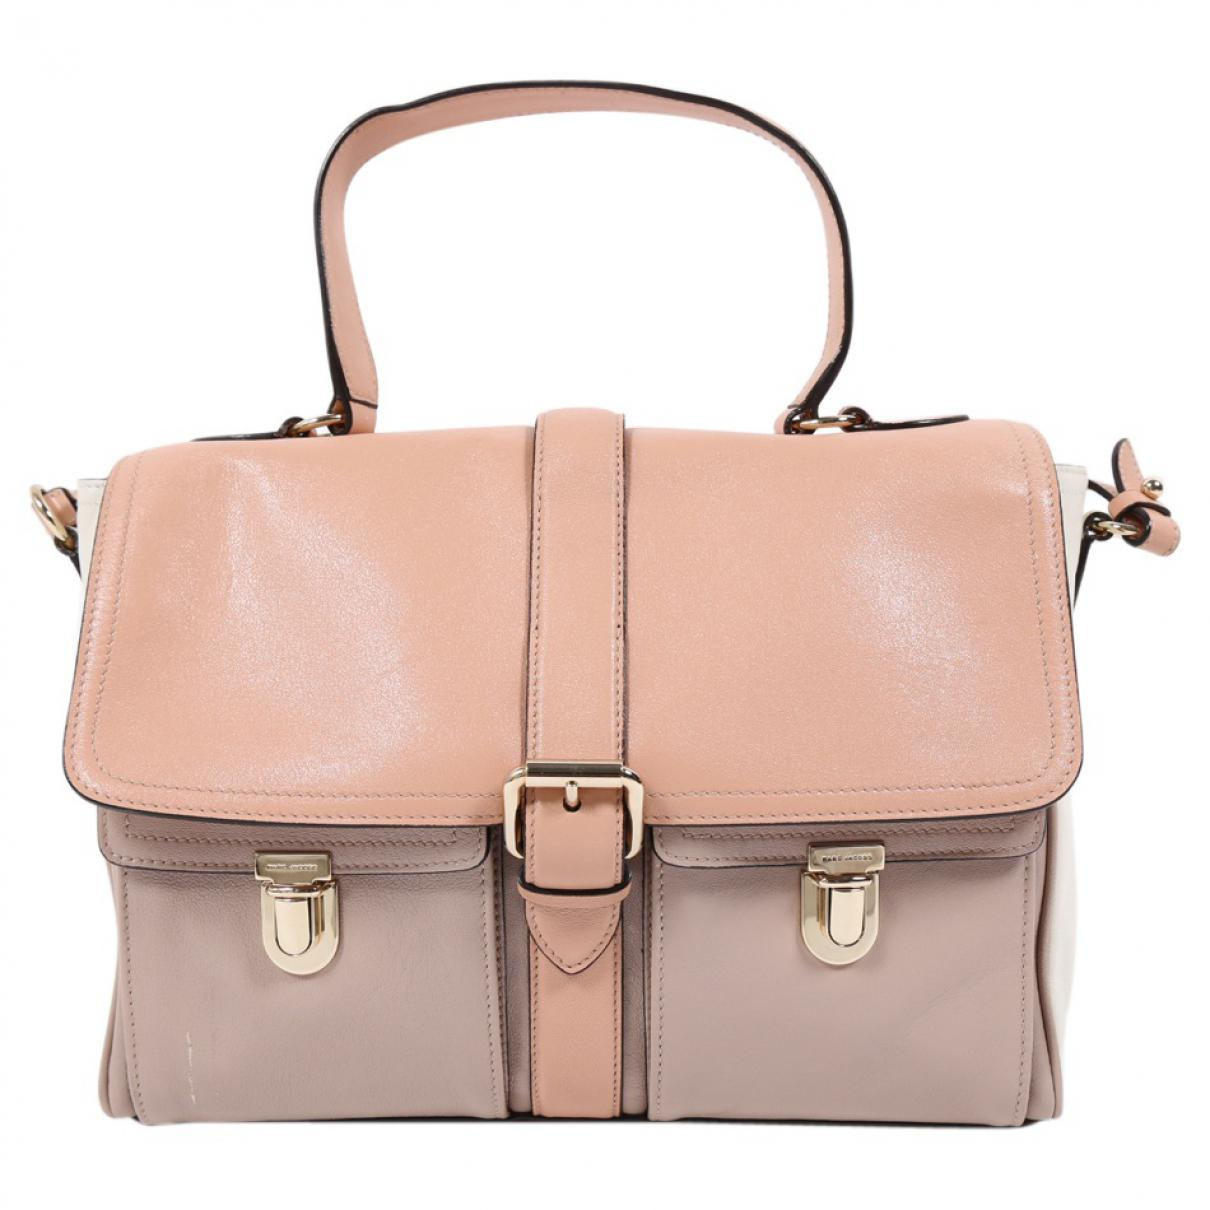 Marc Jacobs Pre-owned - Leather satchel meNDPudF6z